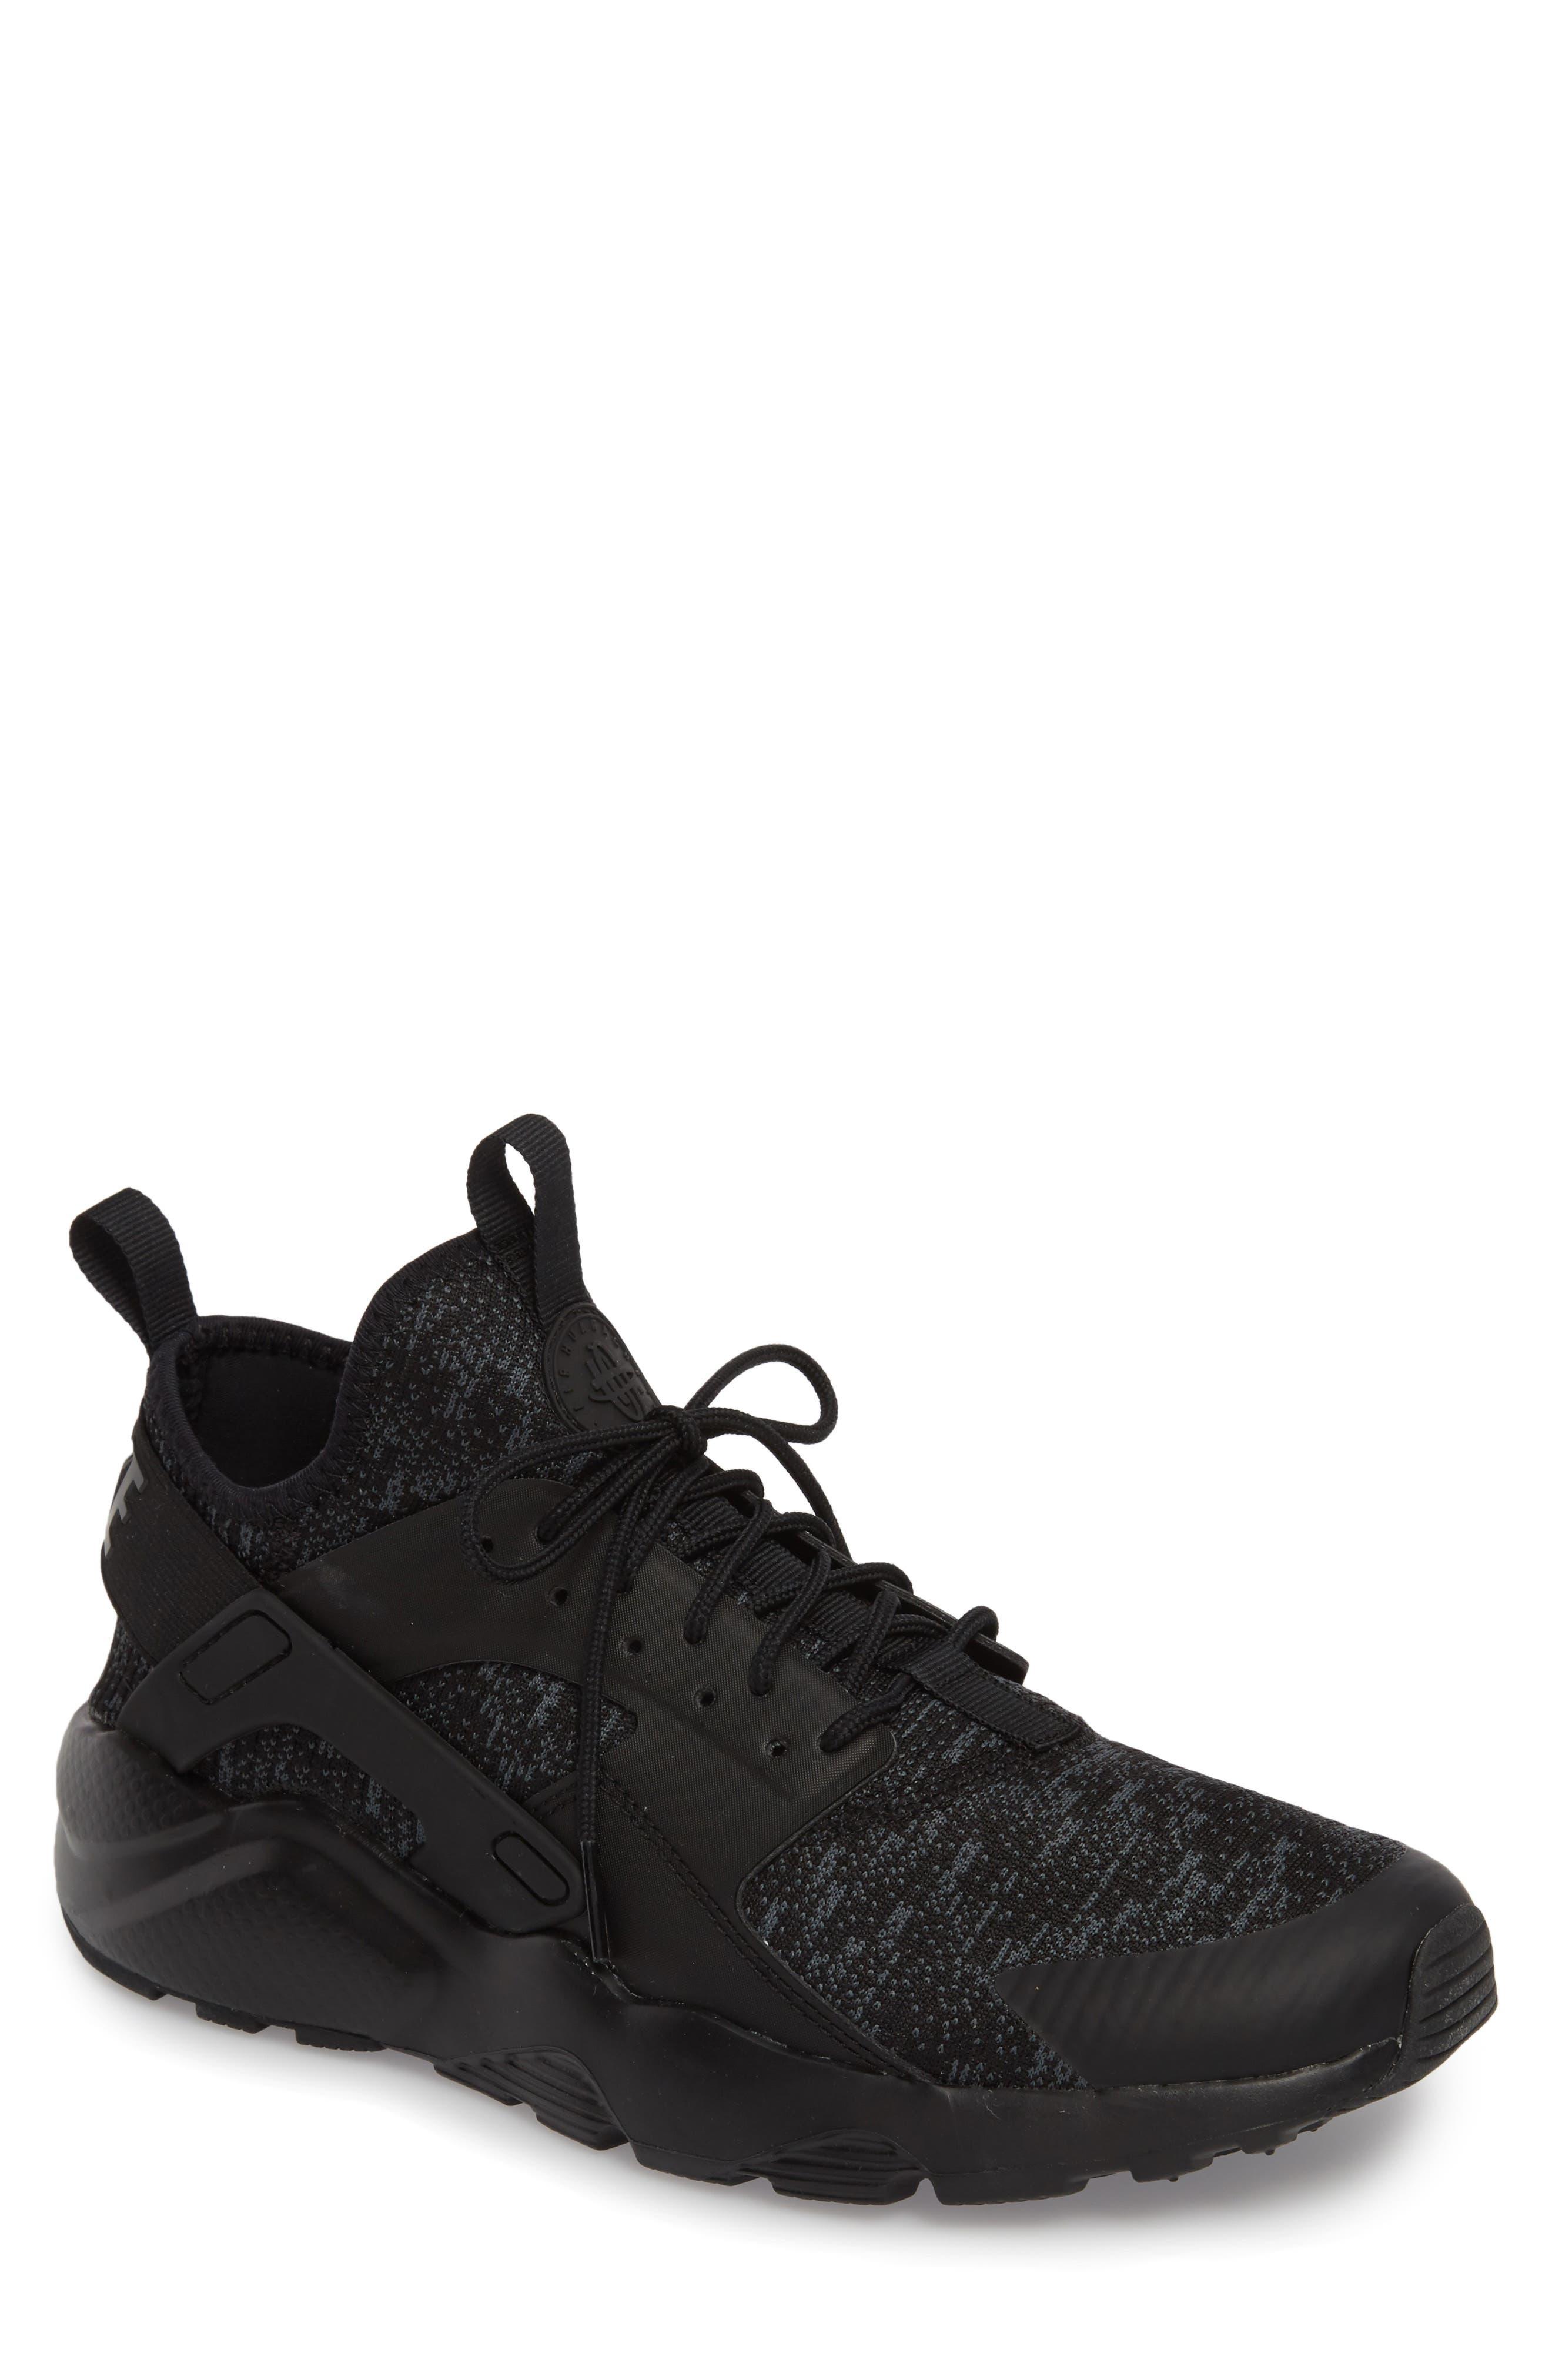 Air Huarache Run Ultra SE Sneaker,                         Main,                         color, 006